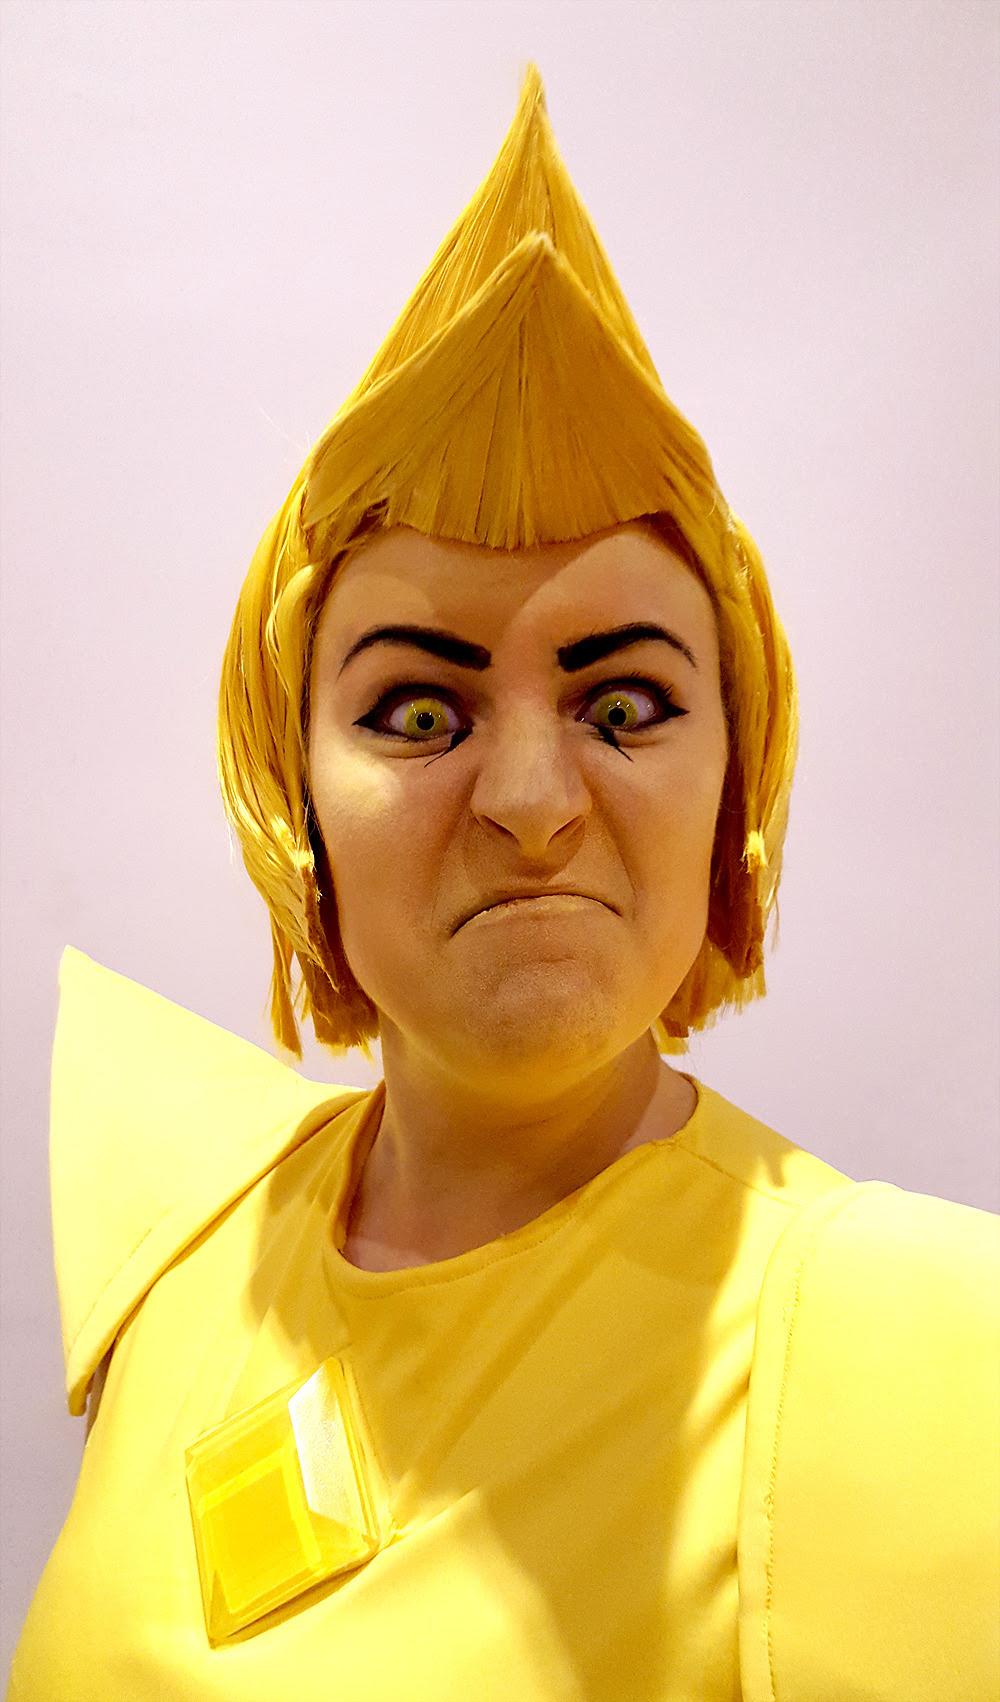 DIAMOND AUTHORITY AT AB ✌ ✌ ✌ Yellow Diamond: @commanderfantasy Blue Diamond: @it-a Lapis: it me Peridot: @amphibizzy Banana: ????